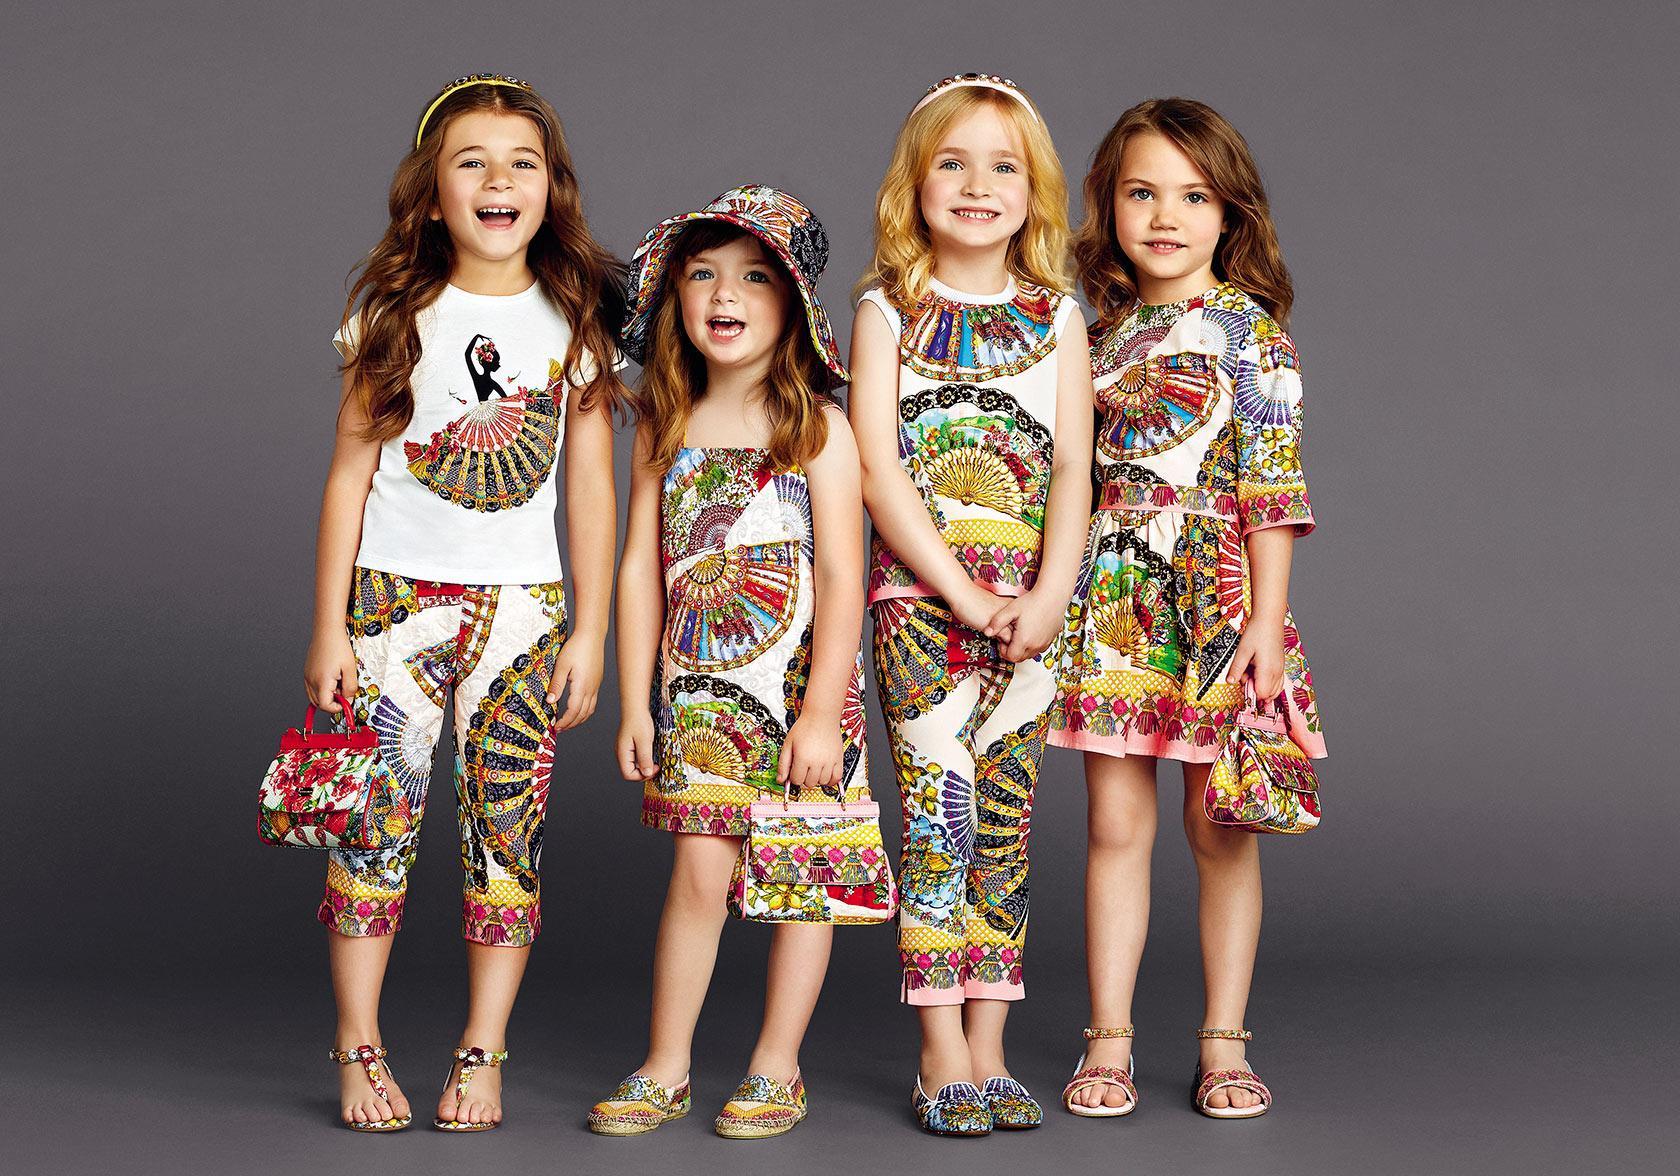 DOLCE & GABBANA summer 2015 girls collection